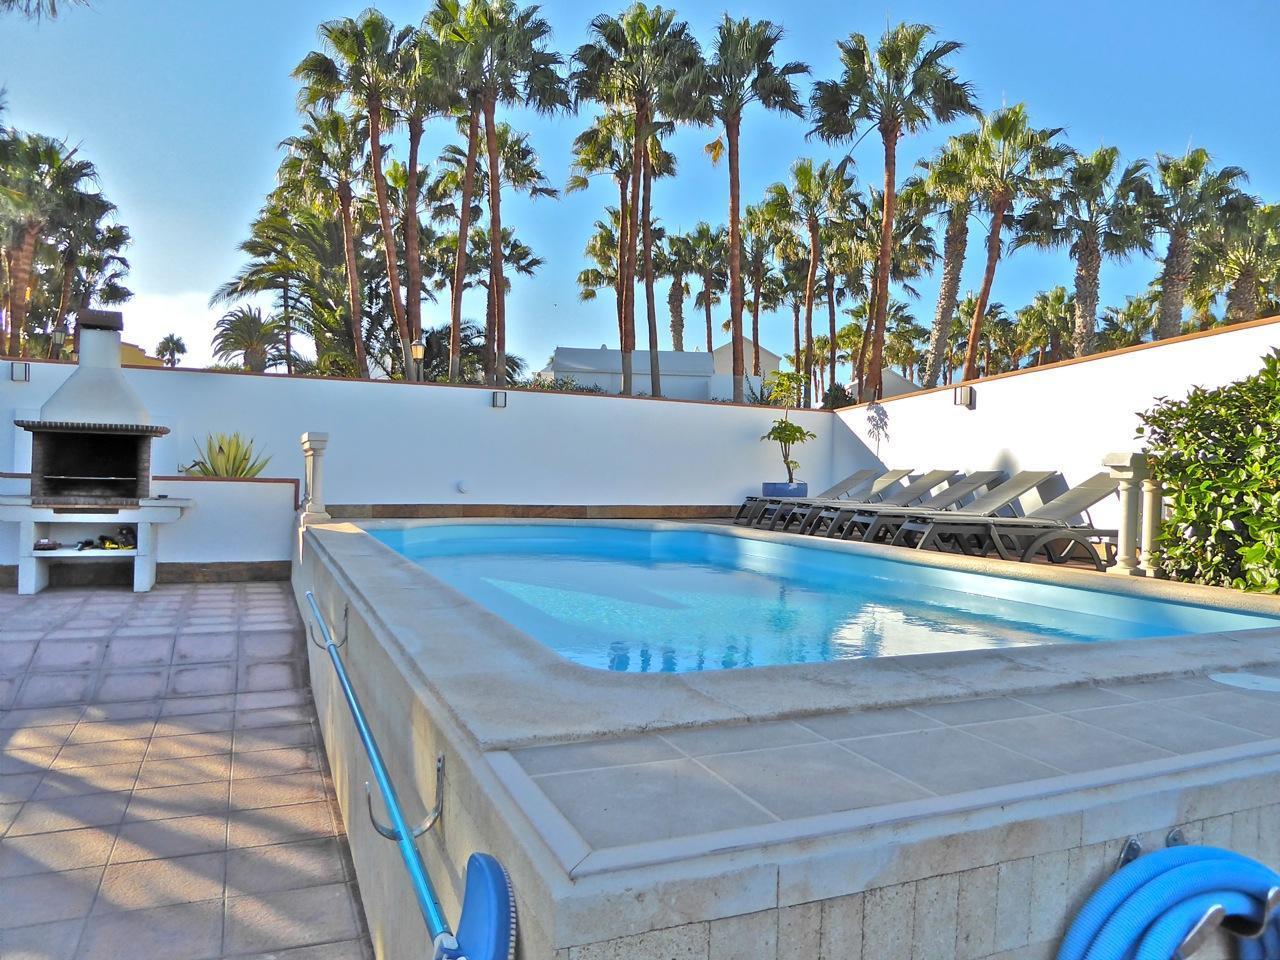 Ferienhaus Ferienhäuser Panorama Jardin PLUS (489054), Costa Calma, Fuerteventura, Kanarische Inseln, Spanien, Bild 14